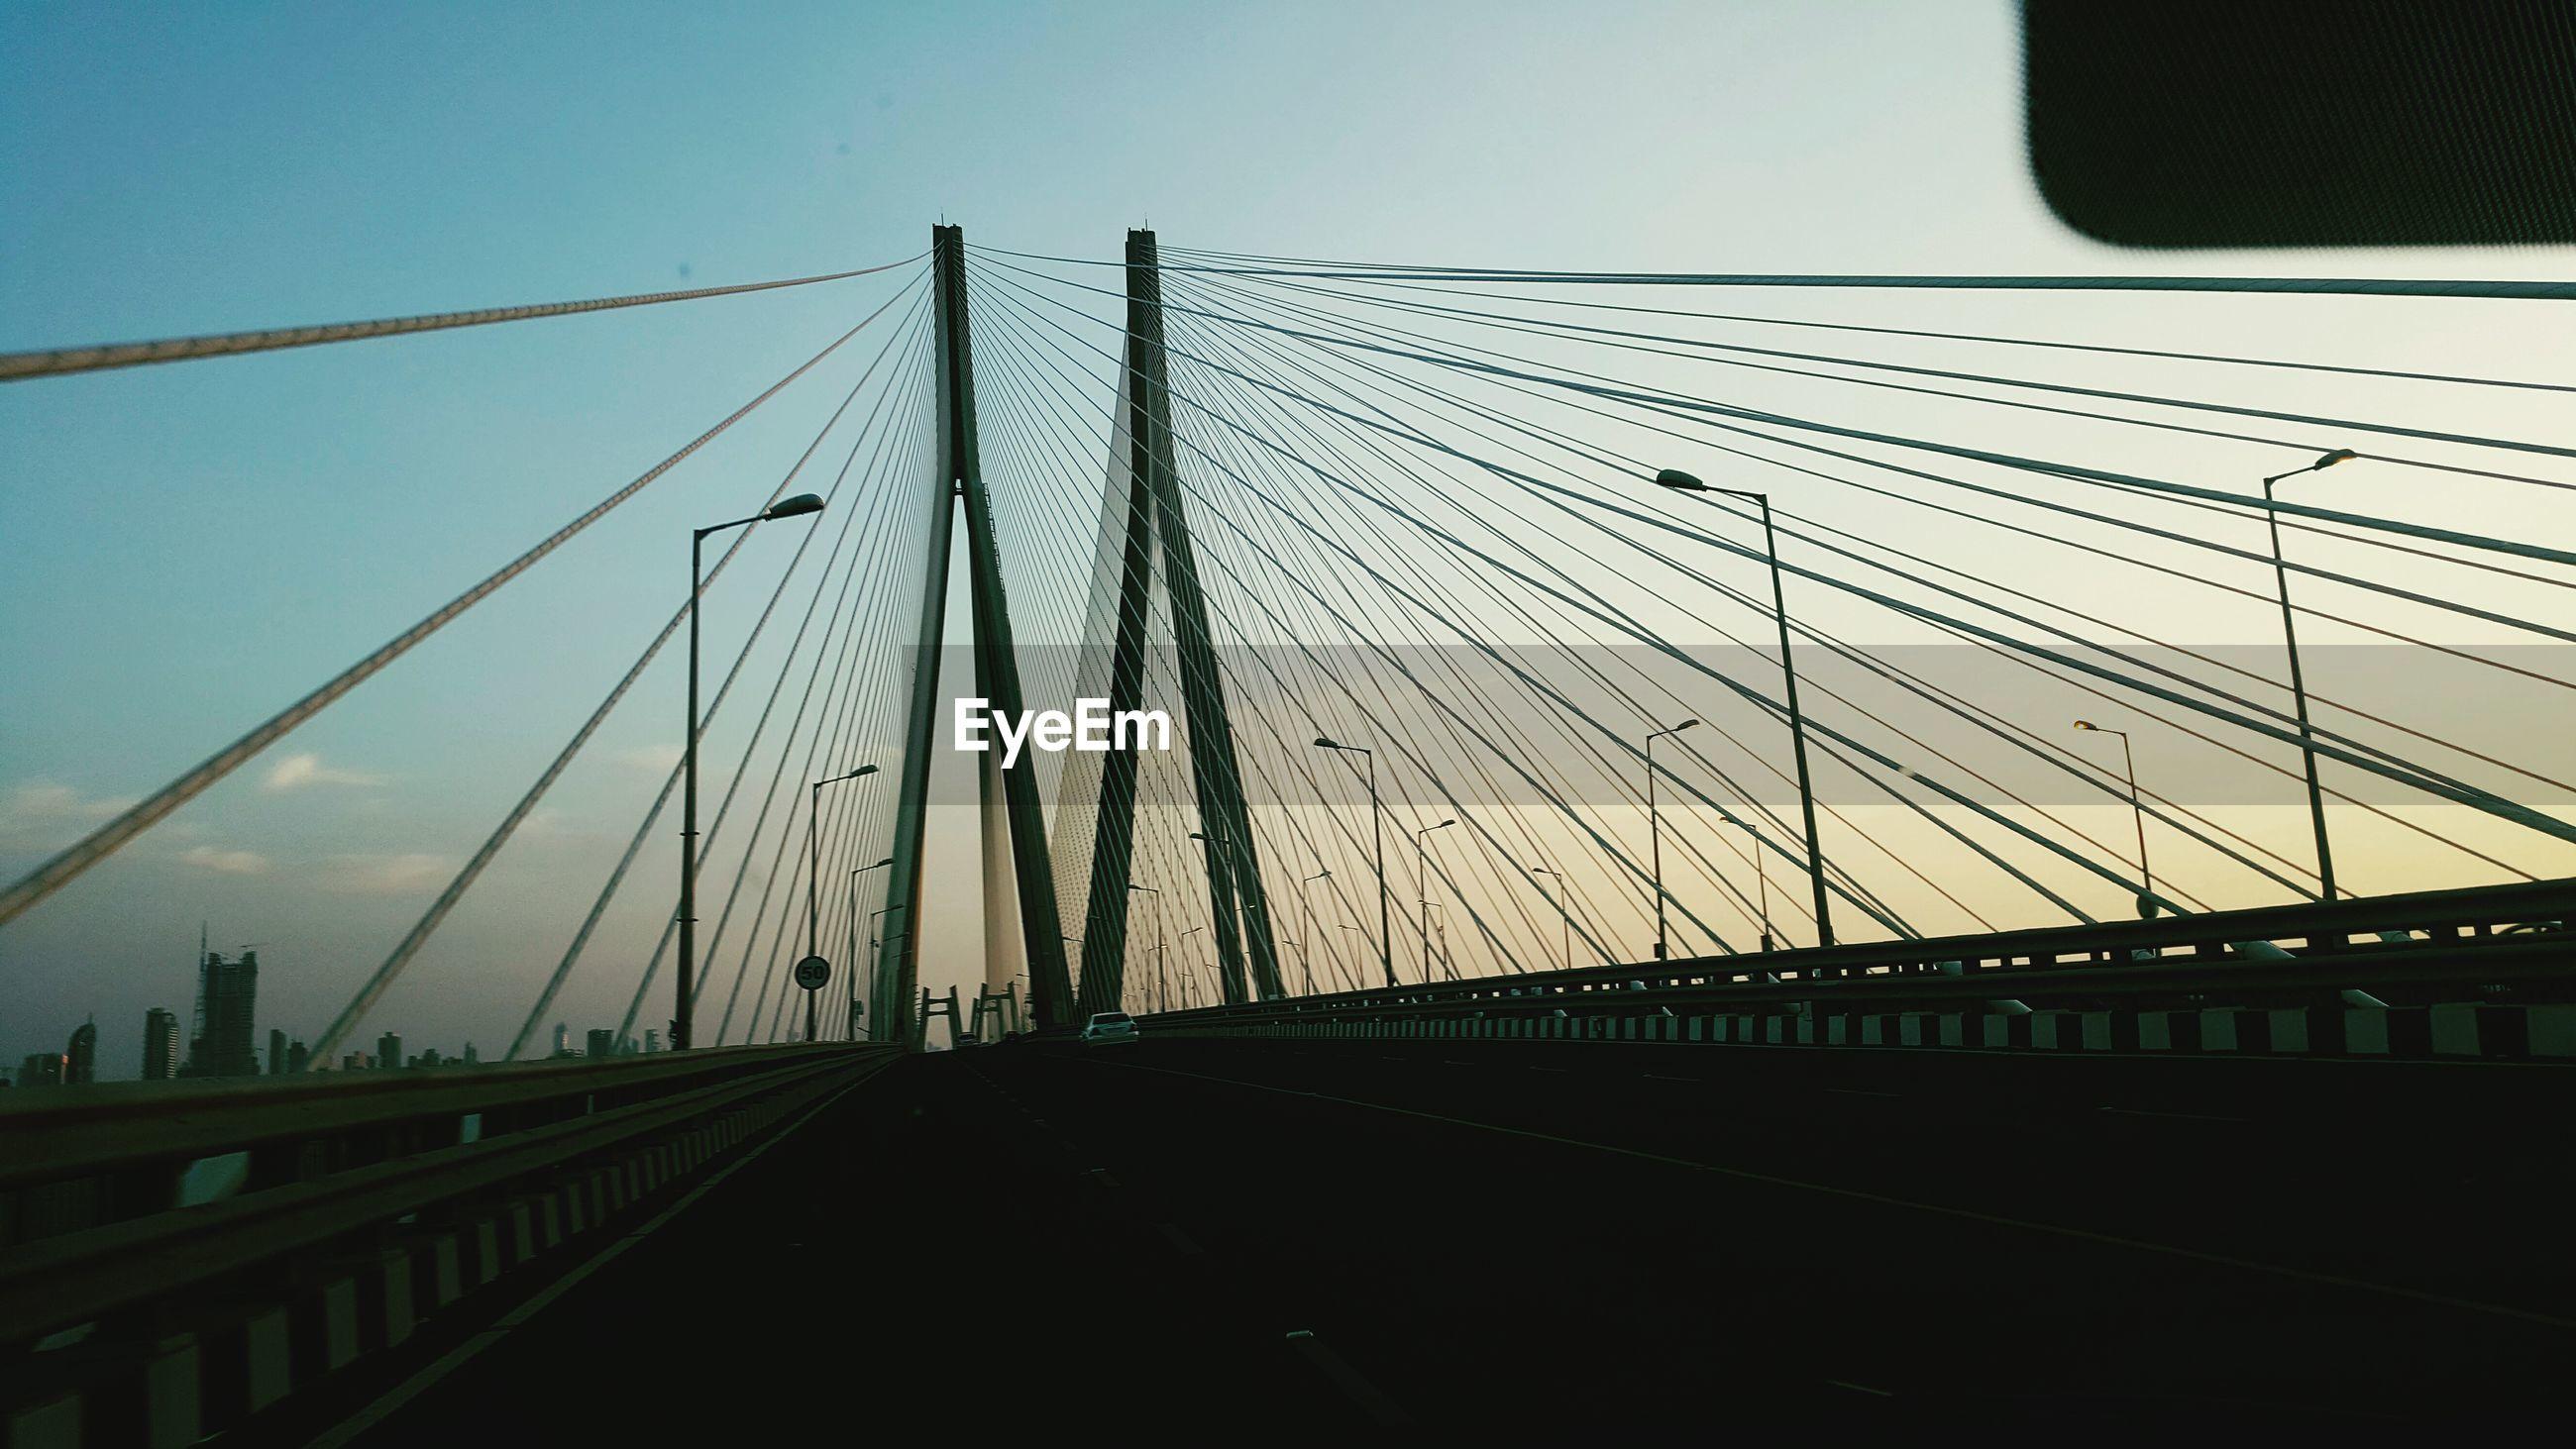 Bandraworli sea link against sky seen through car windshield